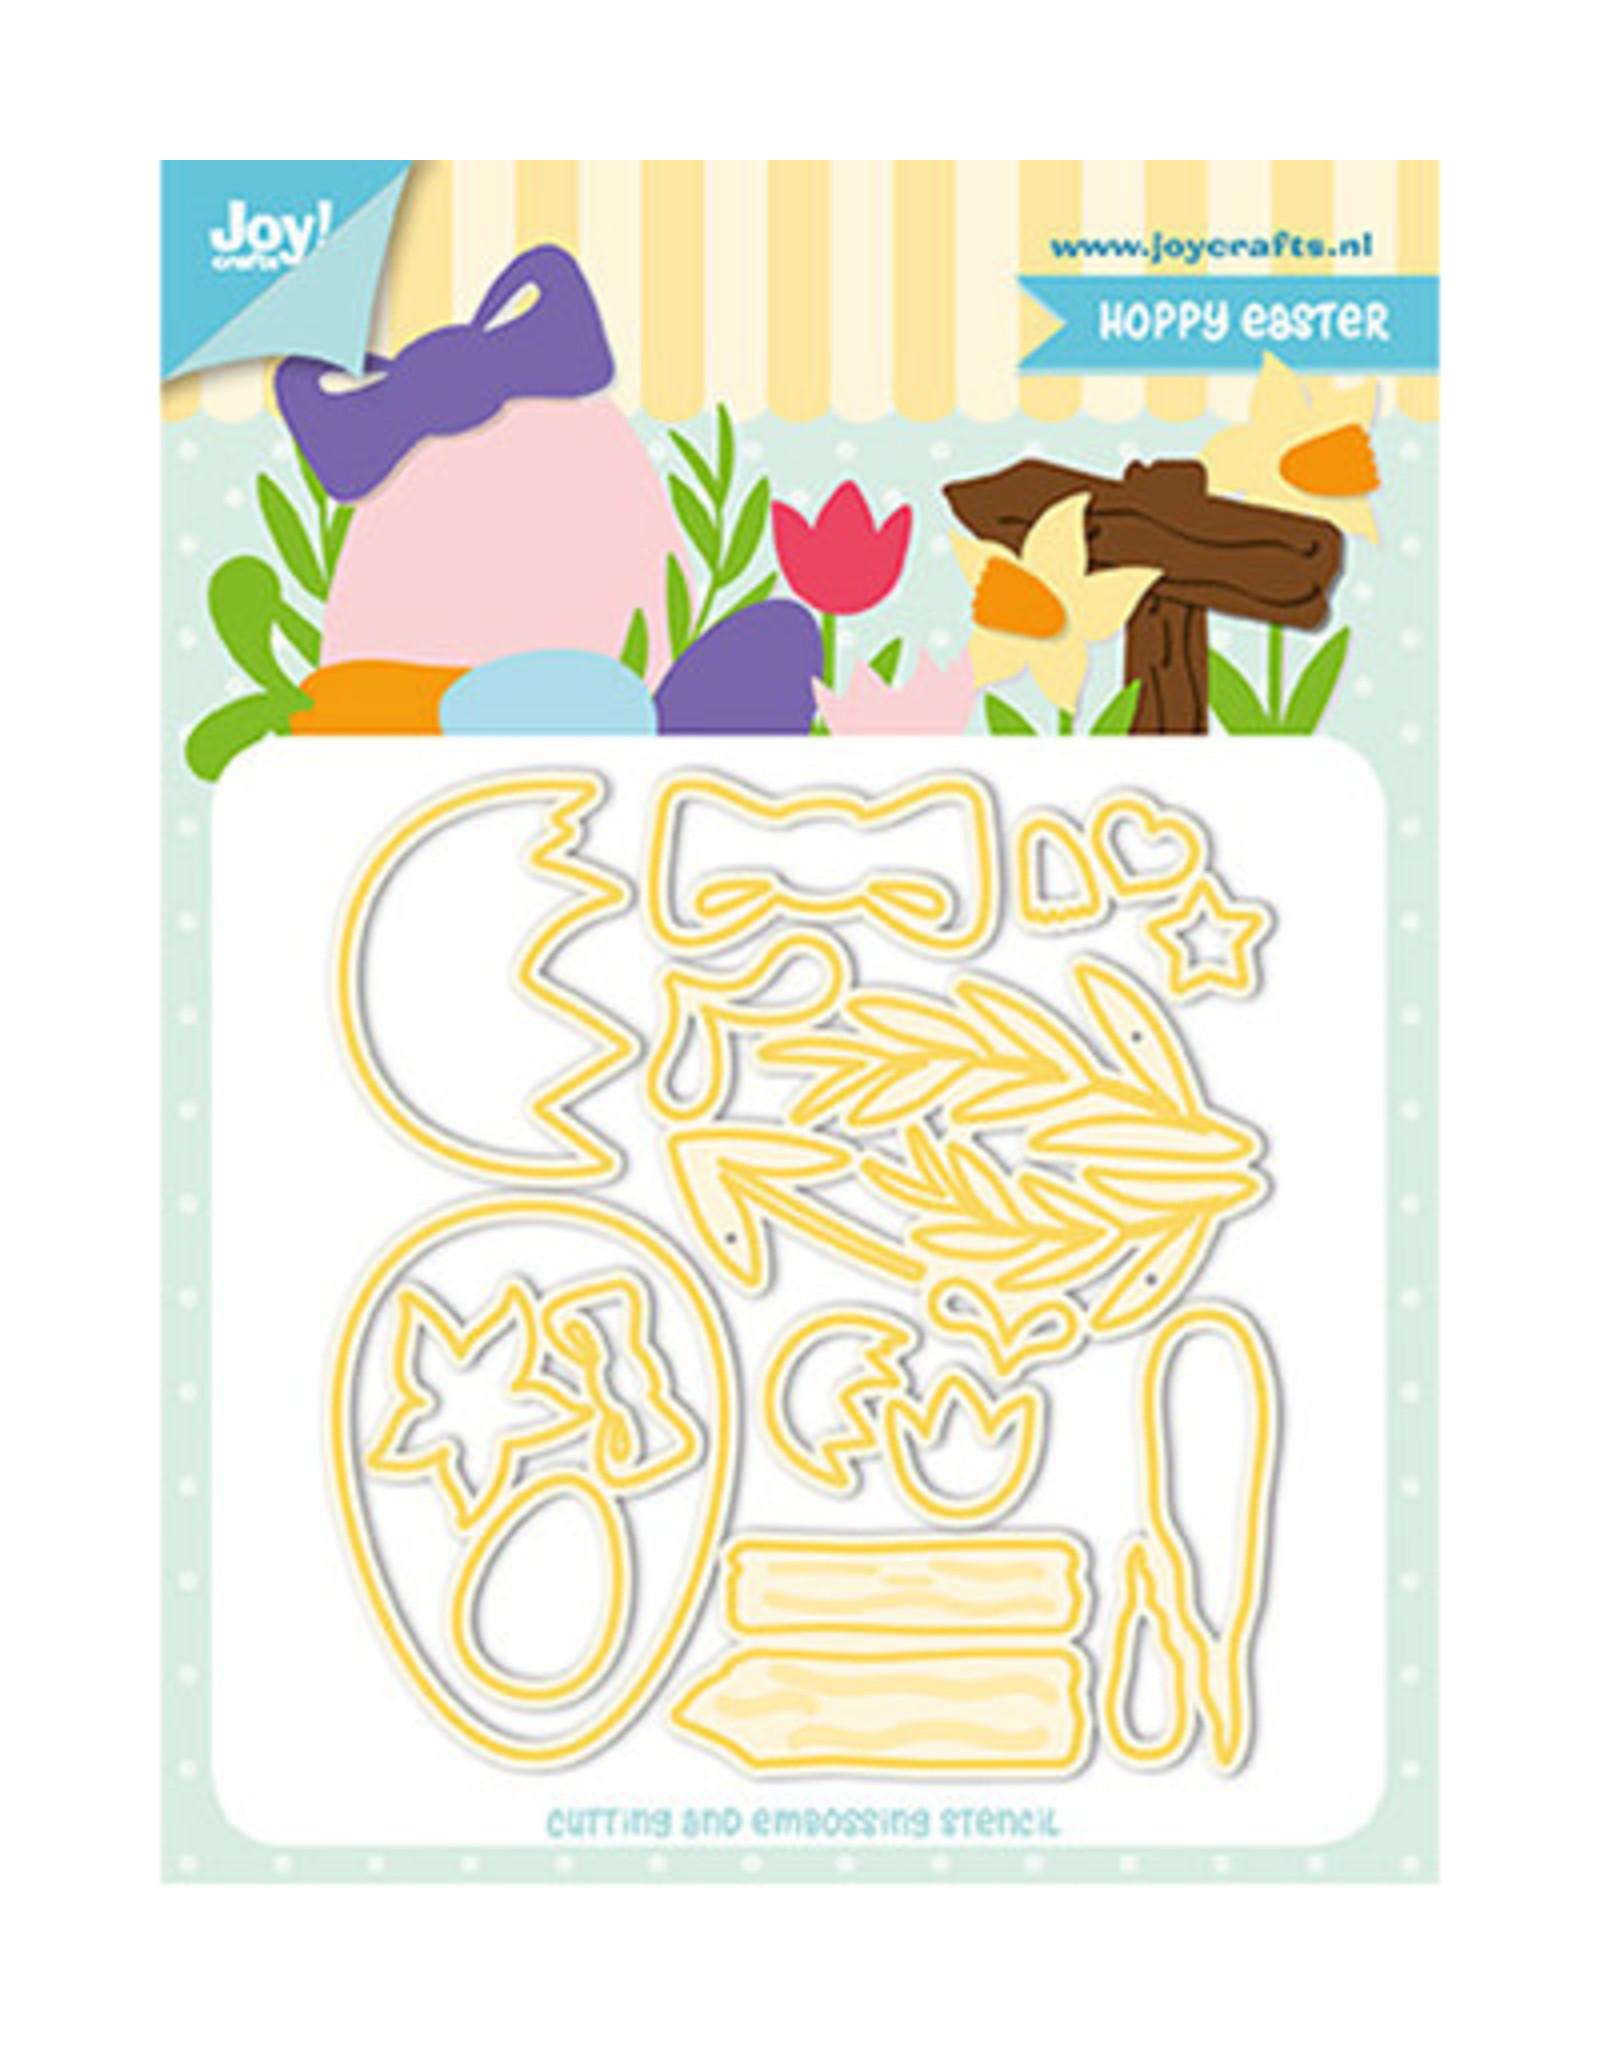 Joy Craft Joy Crafts Pasen Jocelijne - Hoppy Easter 6002/1272